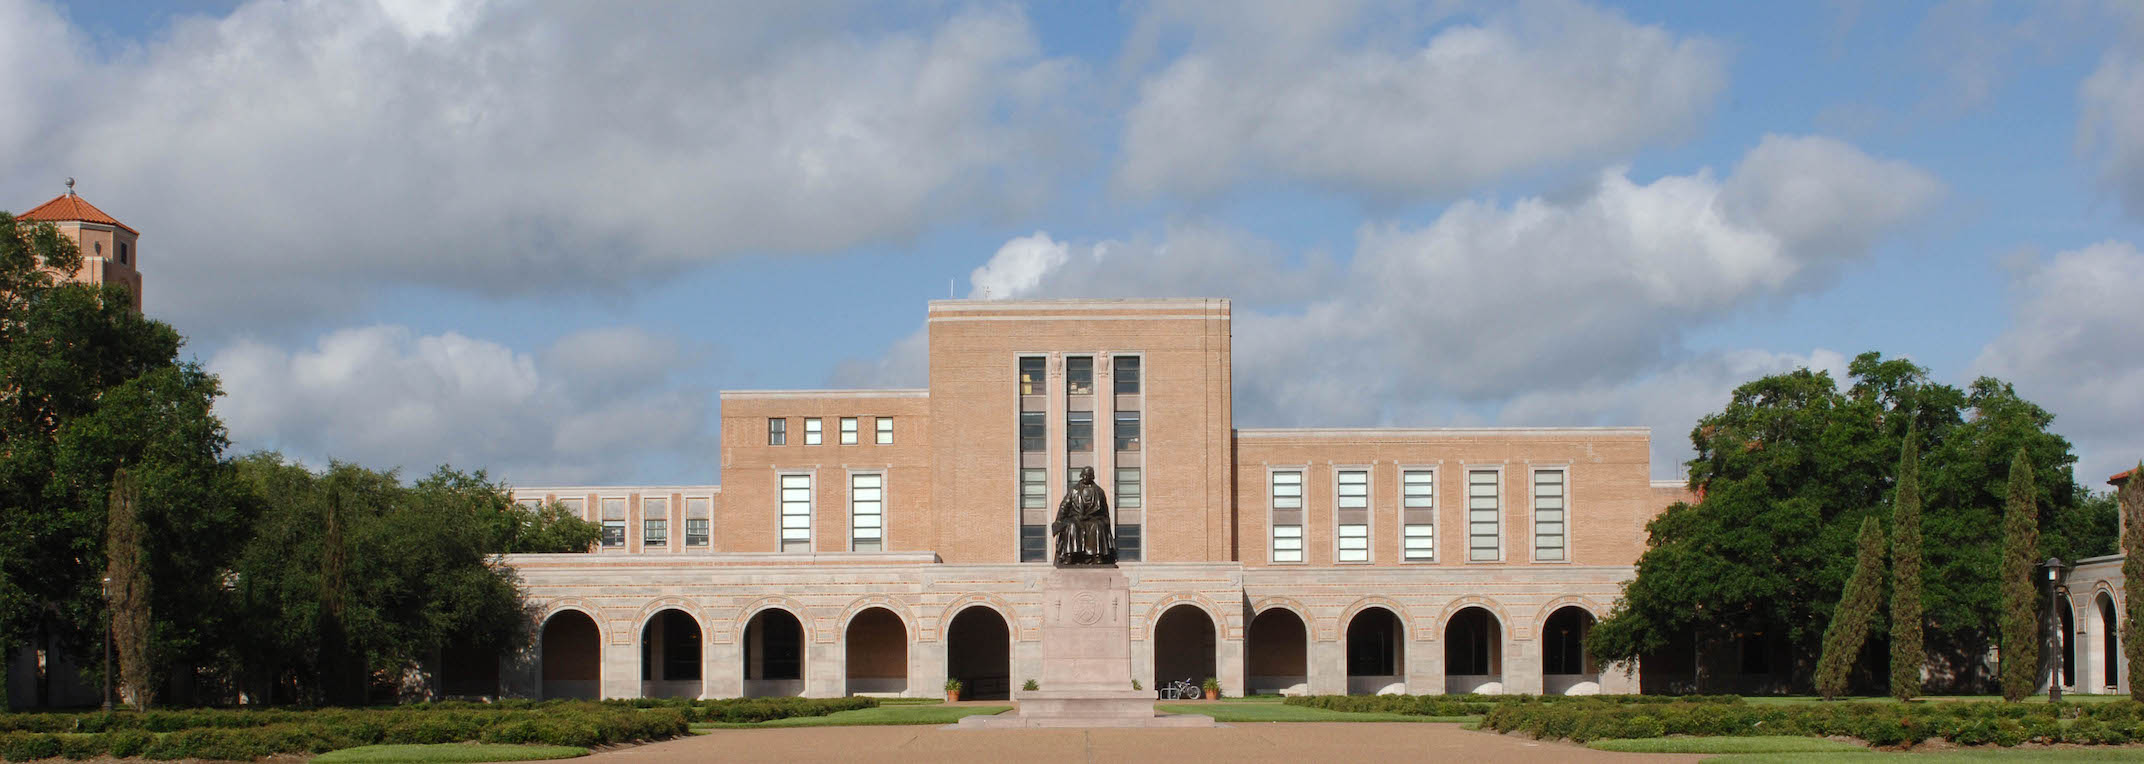 Fondren Library at Rice University